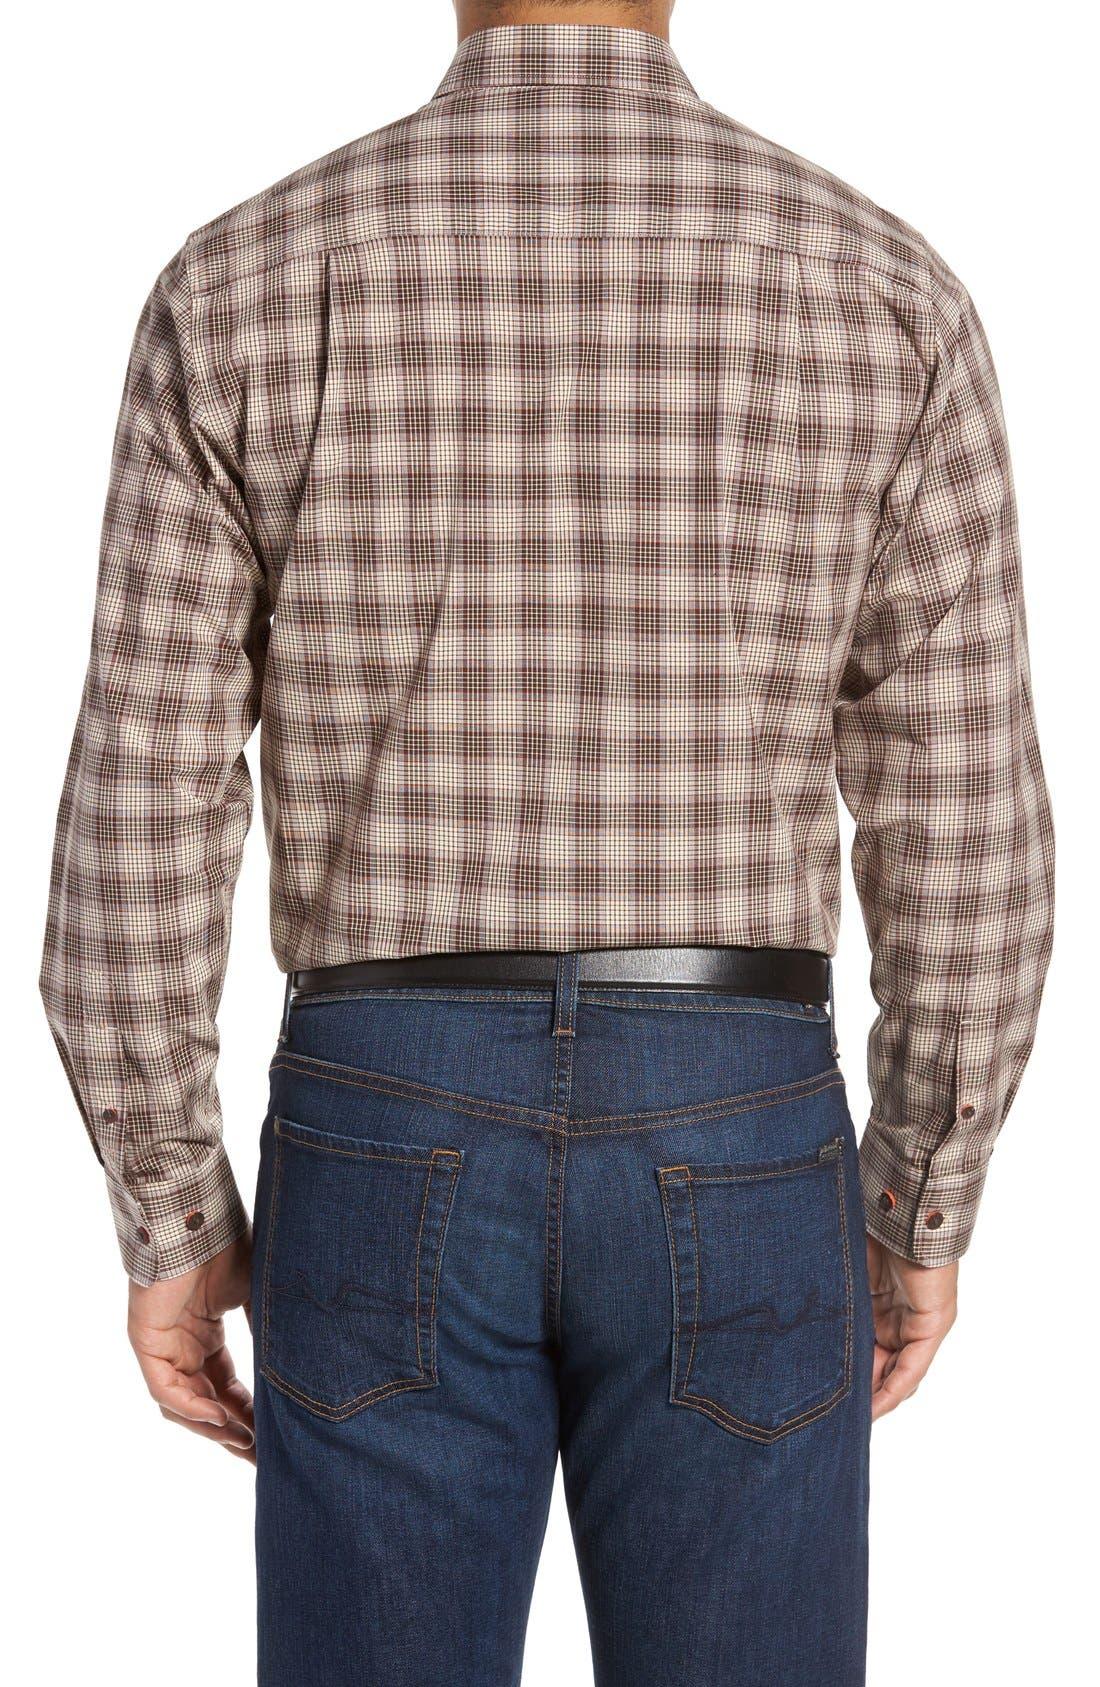 Alternate Image 2  - Cutter & Buck 'Ridge' Plaid Cotton Poplin Sport Shirt (Big & Tall)